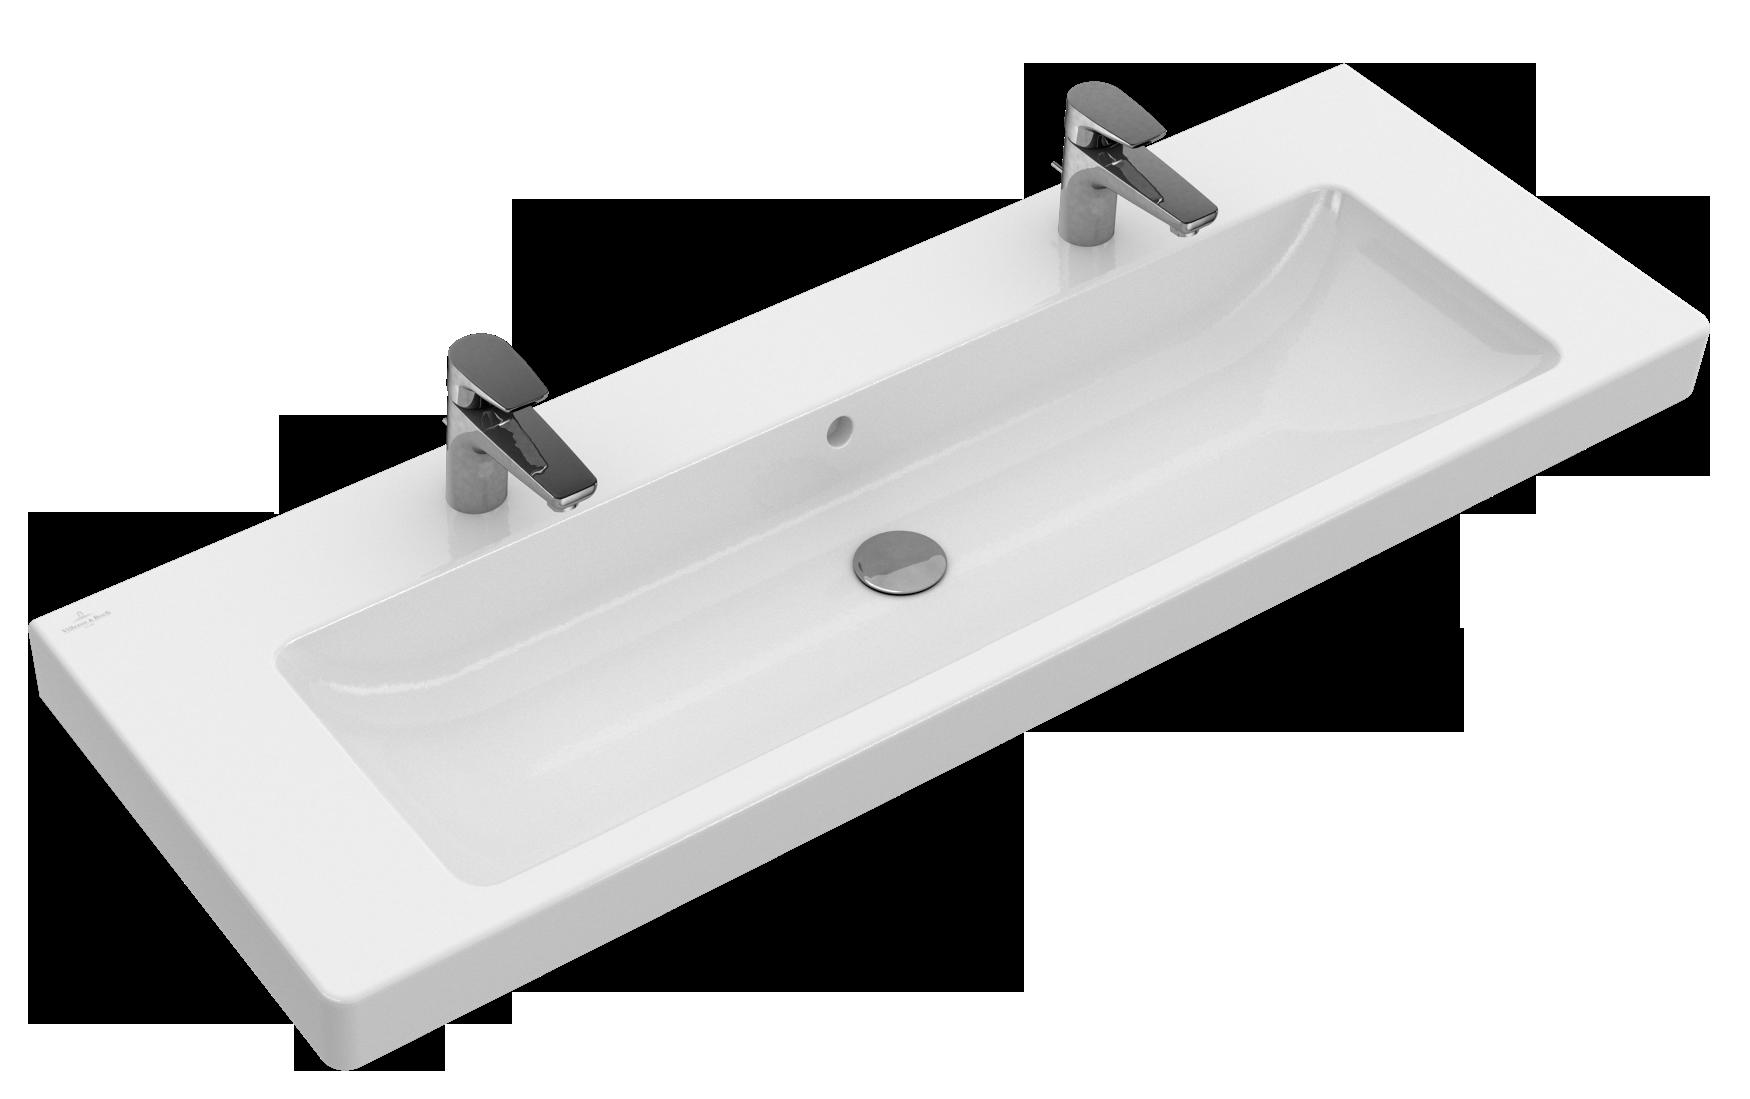 subway 2 0 vanity washbasin angular 7176d2 villeroy boch. Black Bedroom Furniture Sets. Home Design Ideas